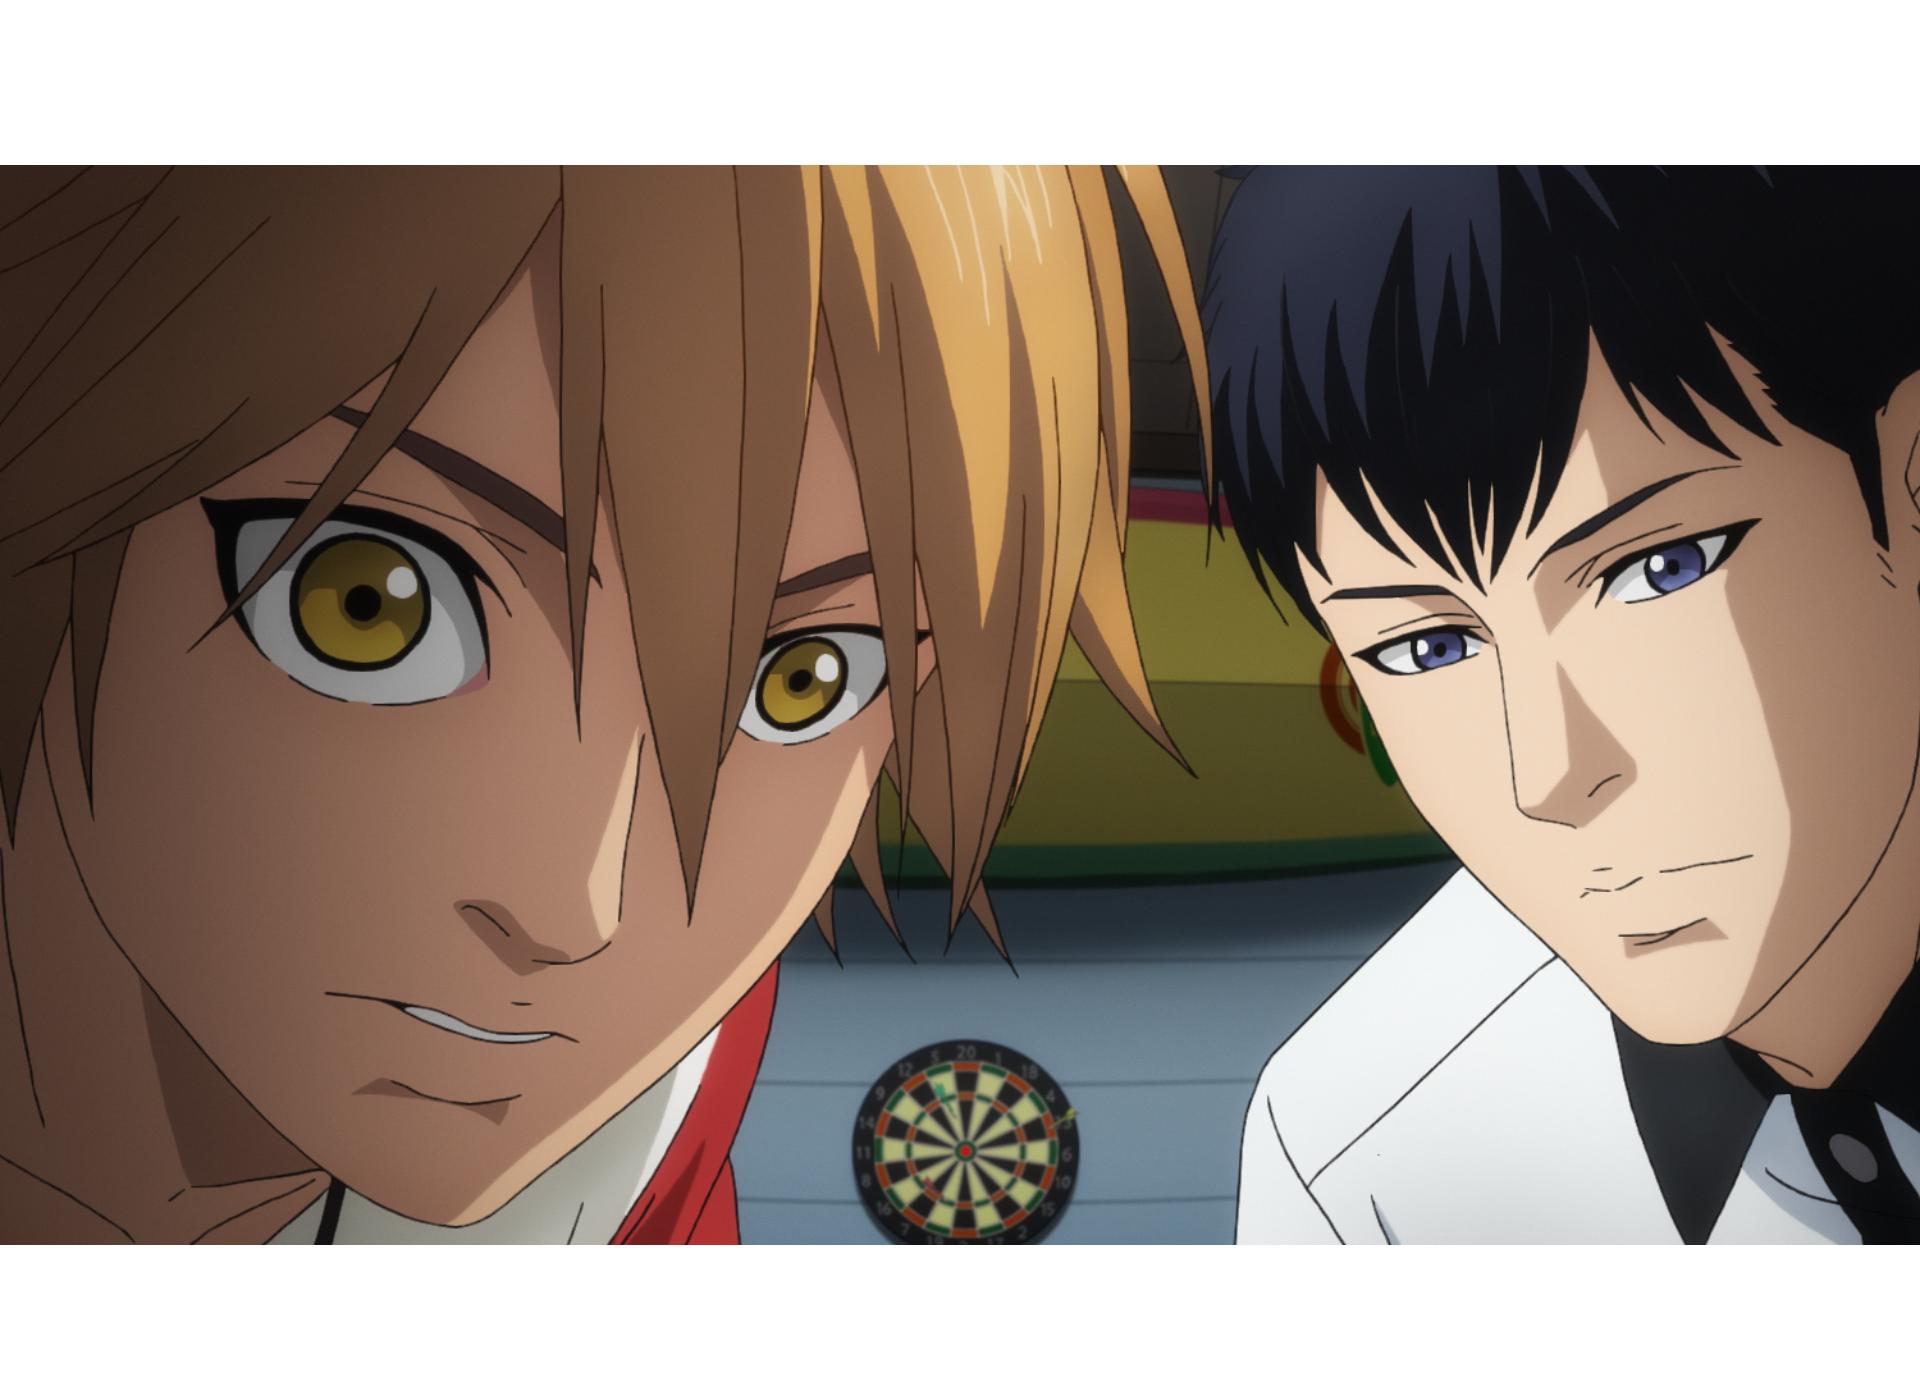 TVアニメ『pet』2020年1月より放送開始!最新PV&追加キャスト公開